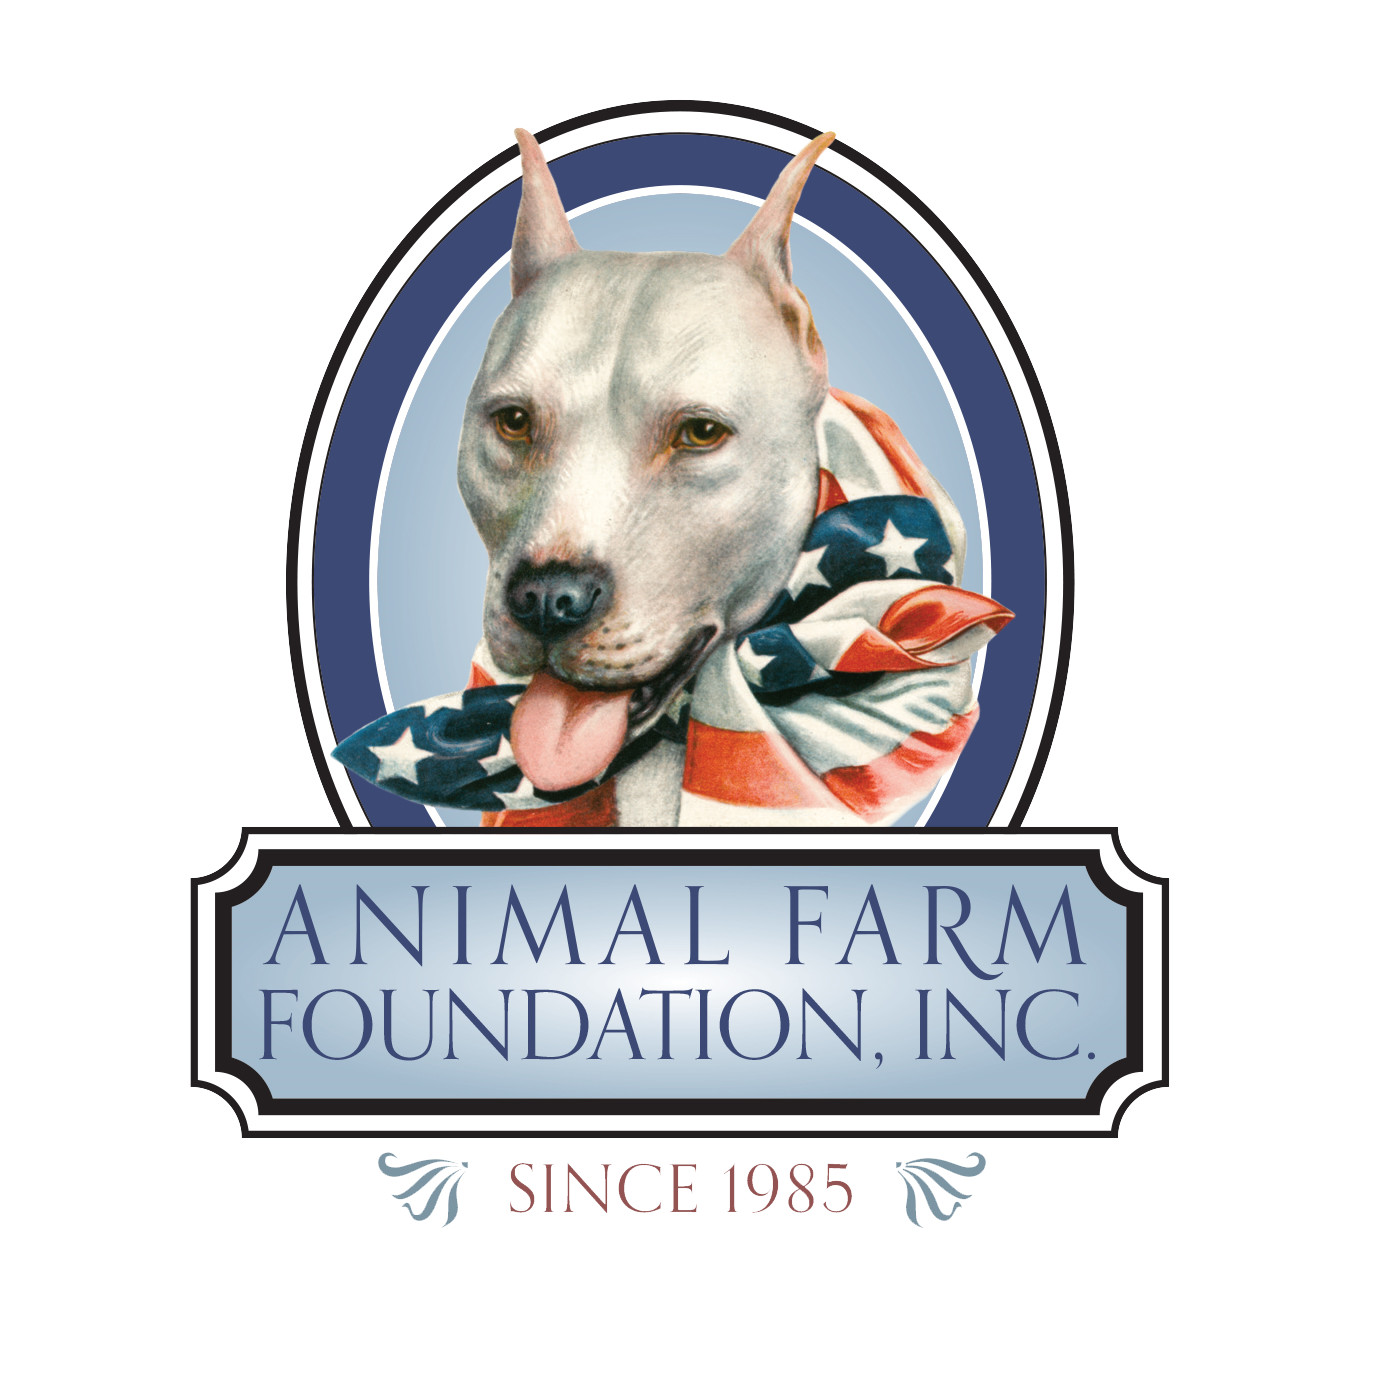 Animal Farm Foundation, Inc.